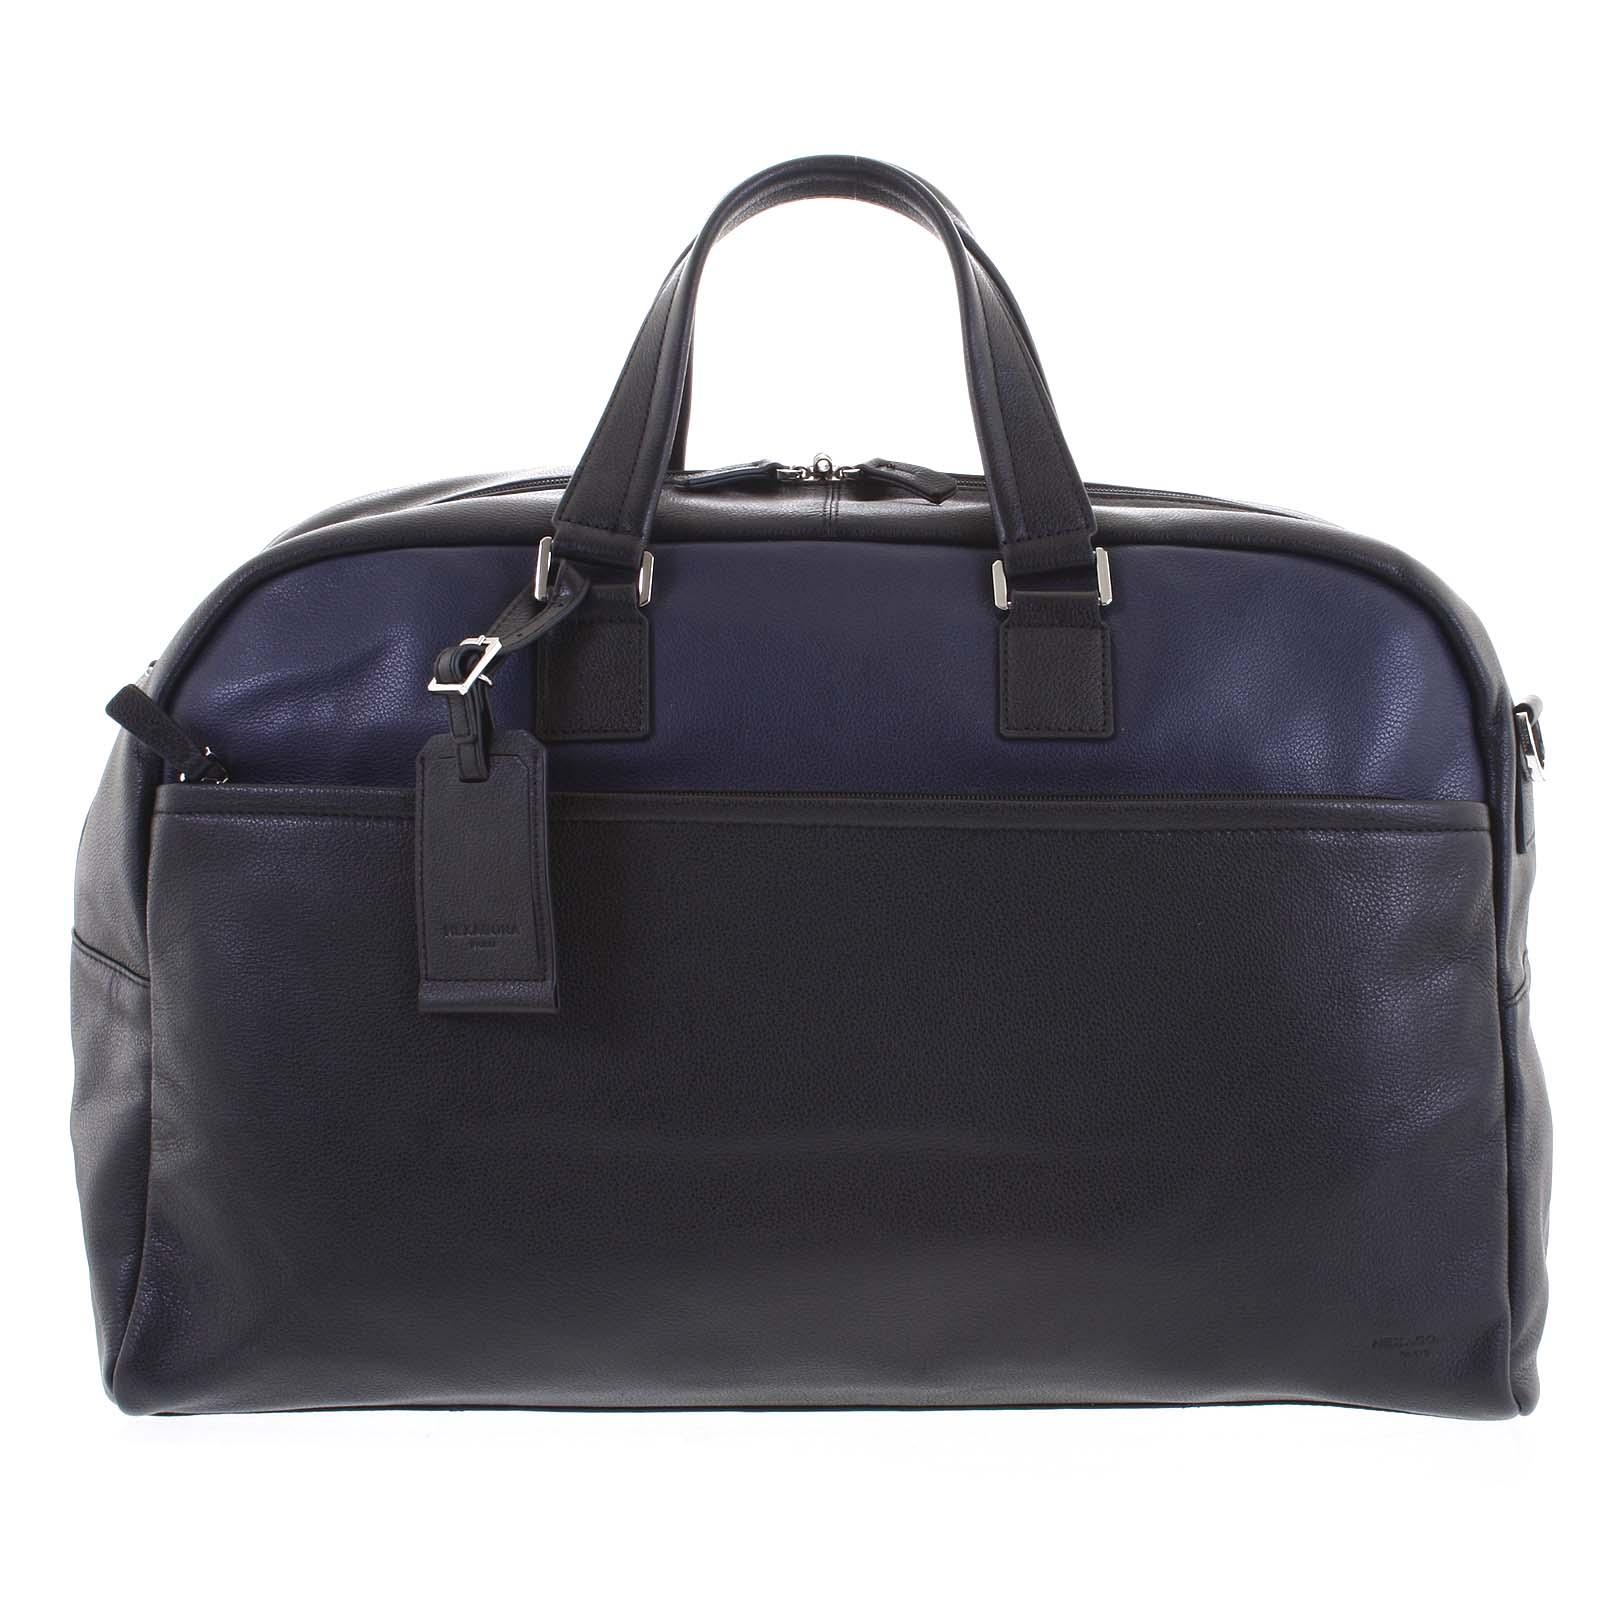 Cestovní kožená taška černo modrá - Hexagona Everyday